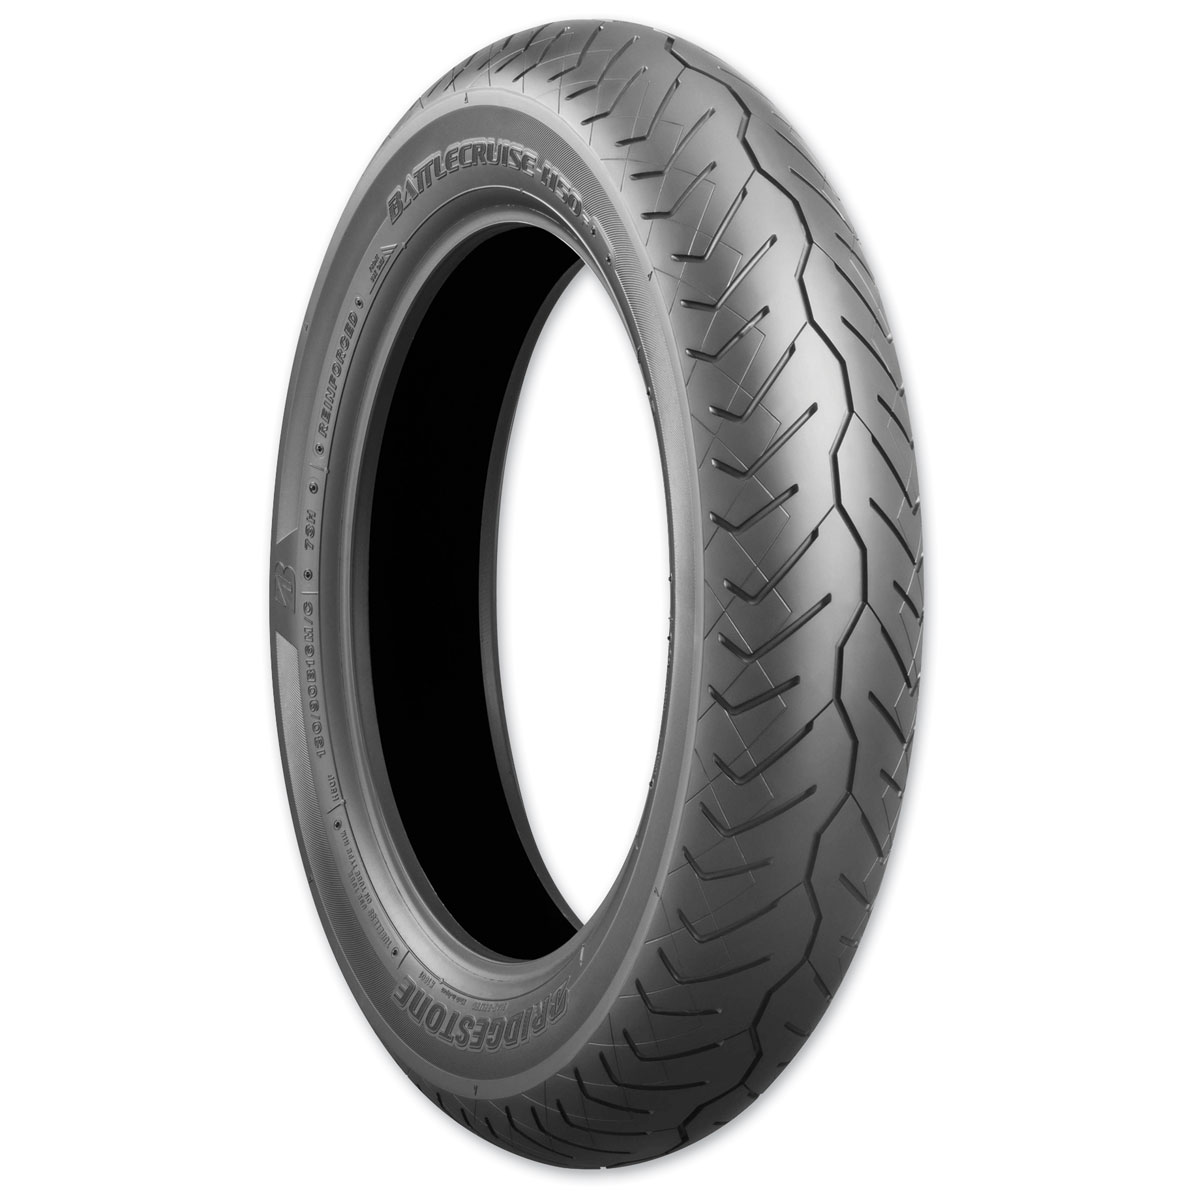 Bridgestone Battlecruise H50 130/70B18 Front Tire